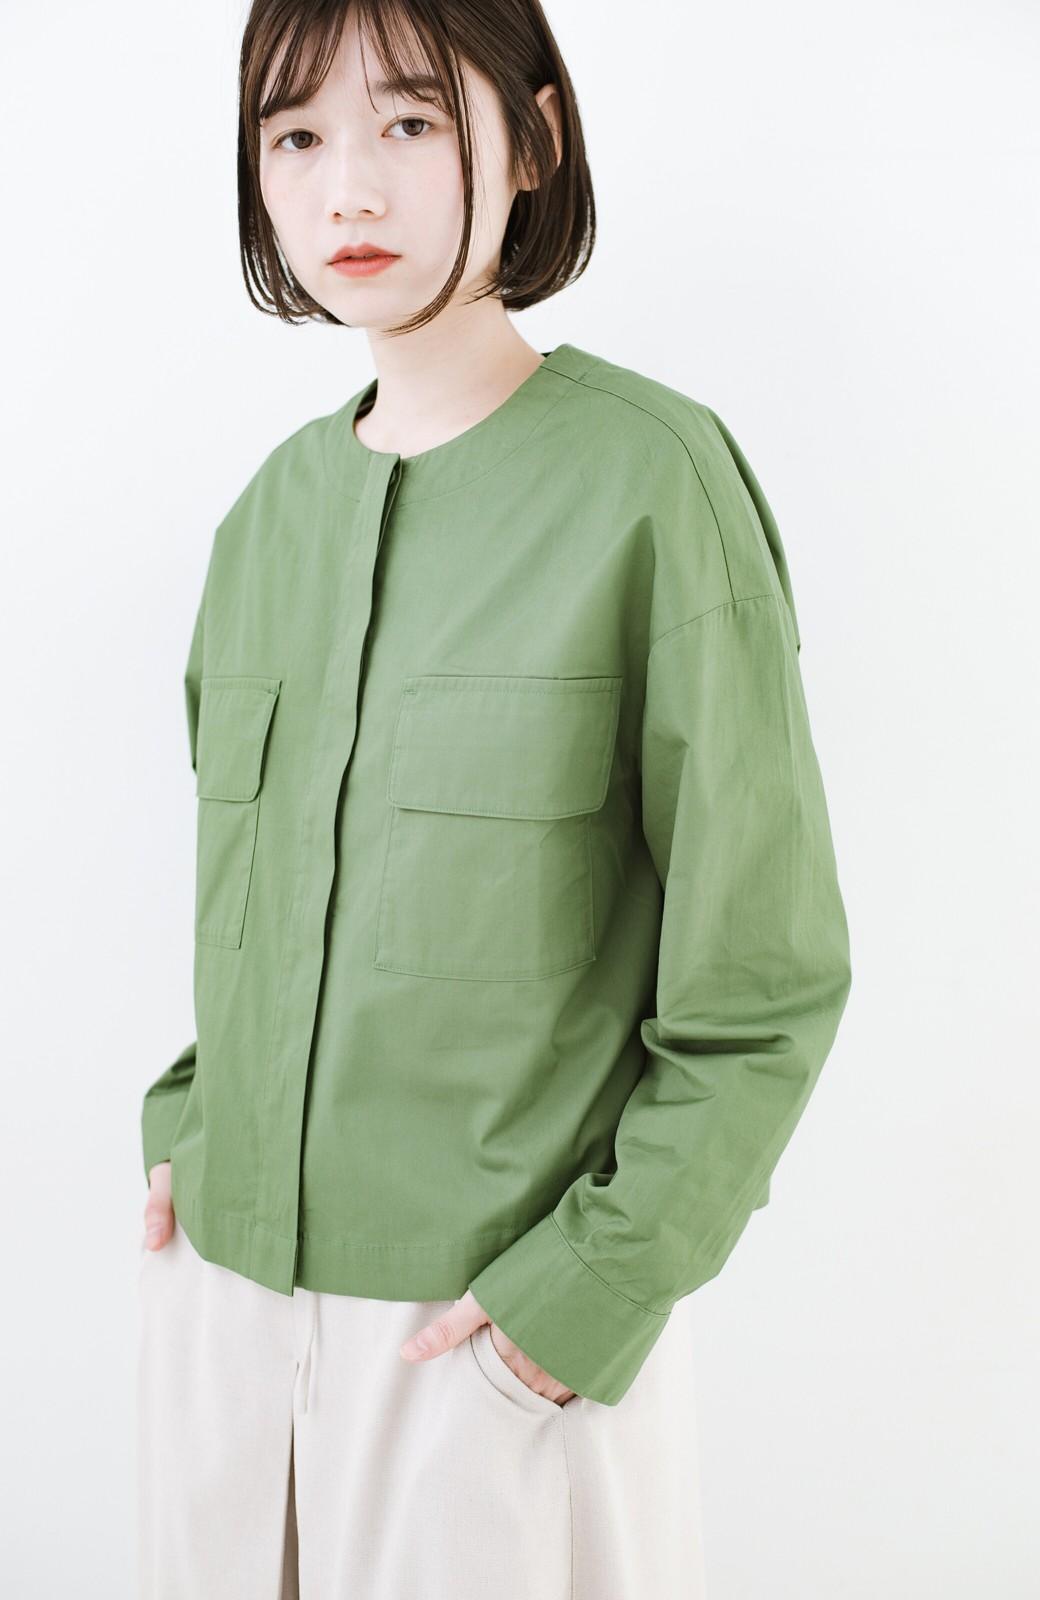 haco! さっと羽織ればコーデに味付け 軽さが自慢のノーカラーミリタリージャケット <カーキ>の商品写真16